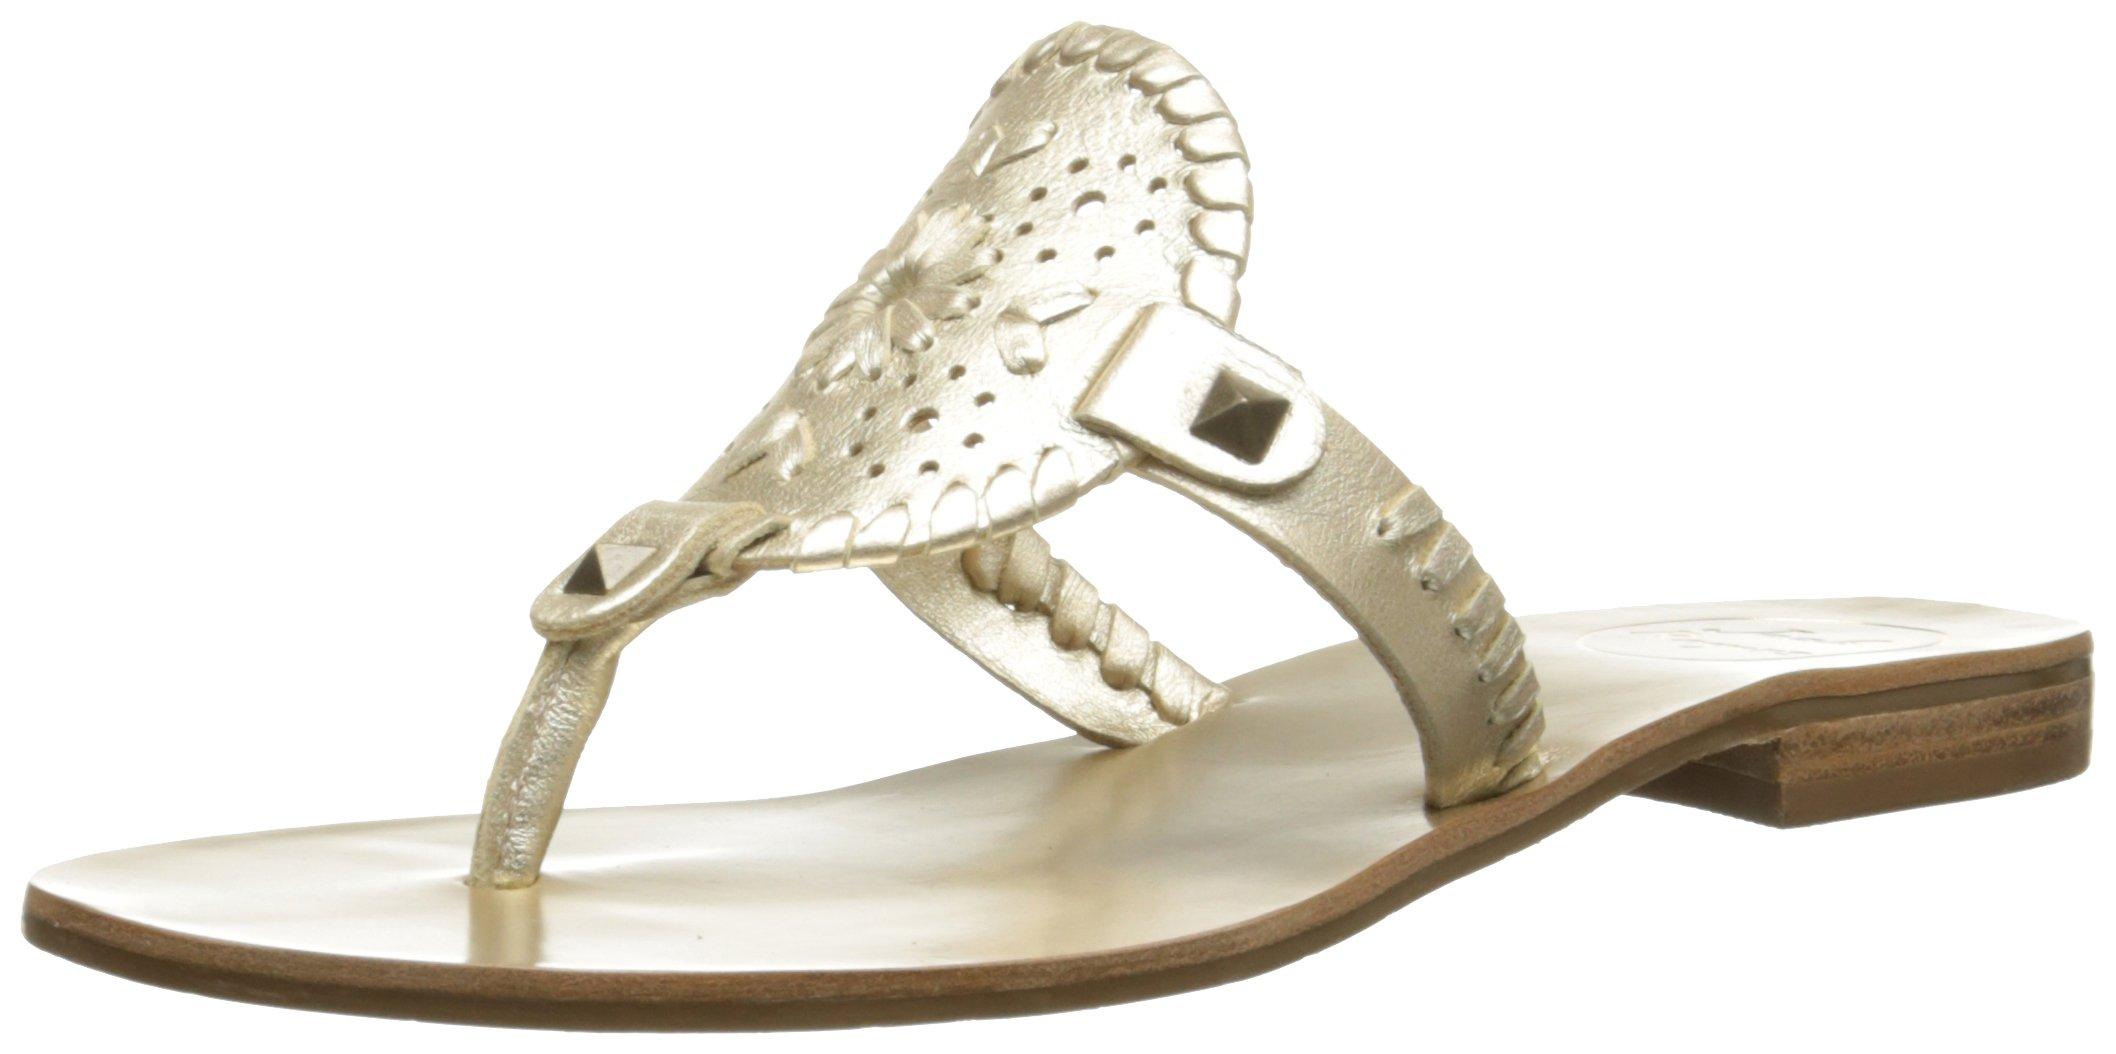 Jack Rogers Women's Georgica Sandal, Platinum, 8.5 M US by Jack Rogers